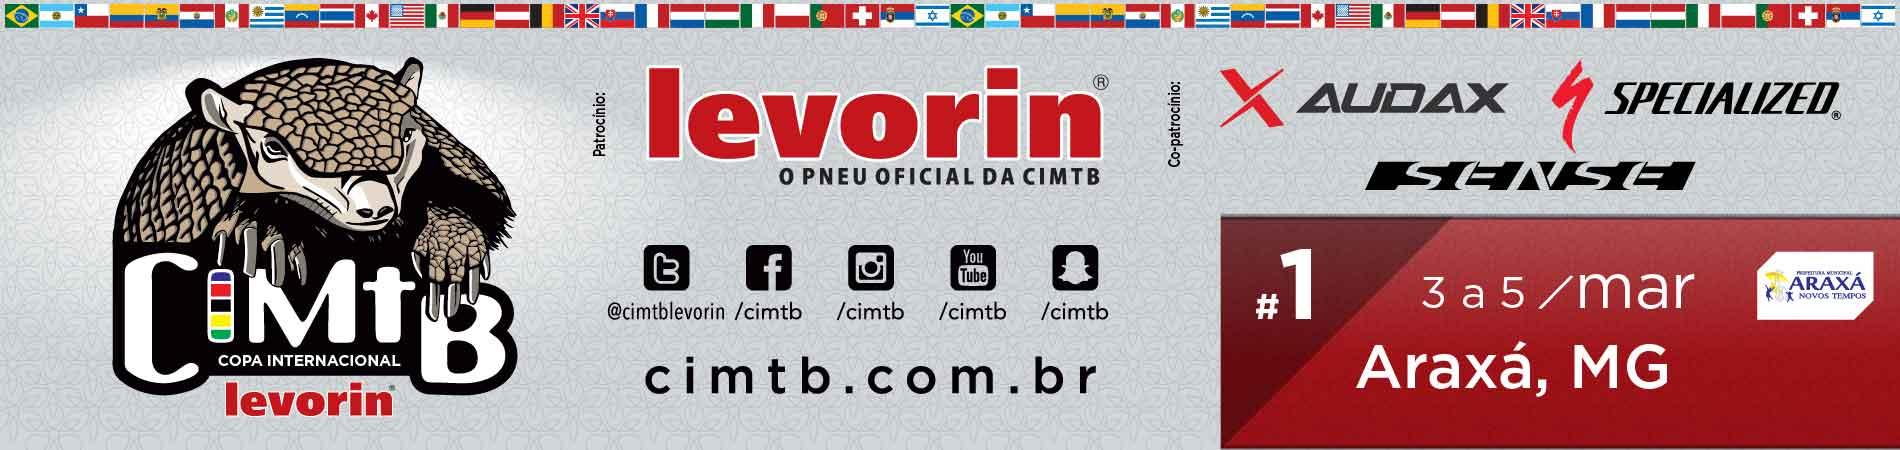 COPA INTERNACIONAL LEVORIN DE MTB - SHC ARAXÁ - Imagem de topo